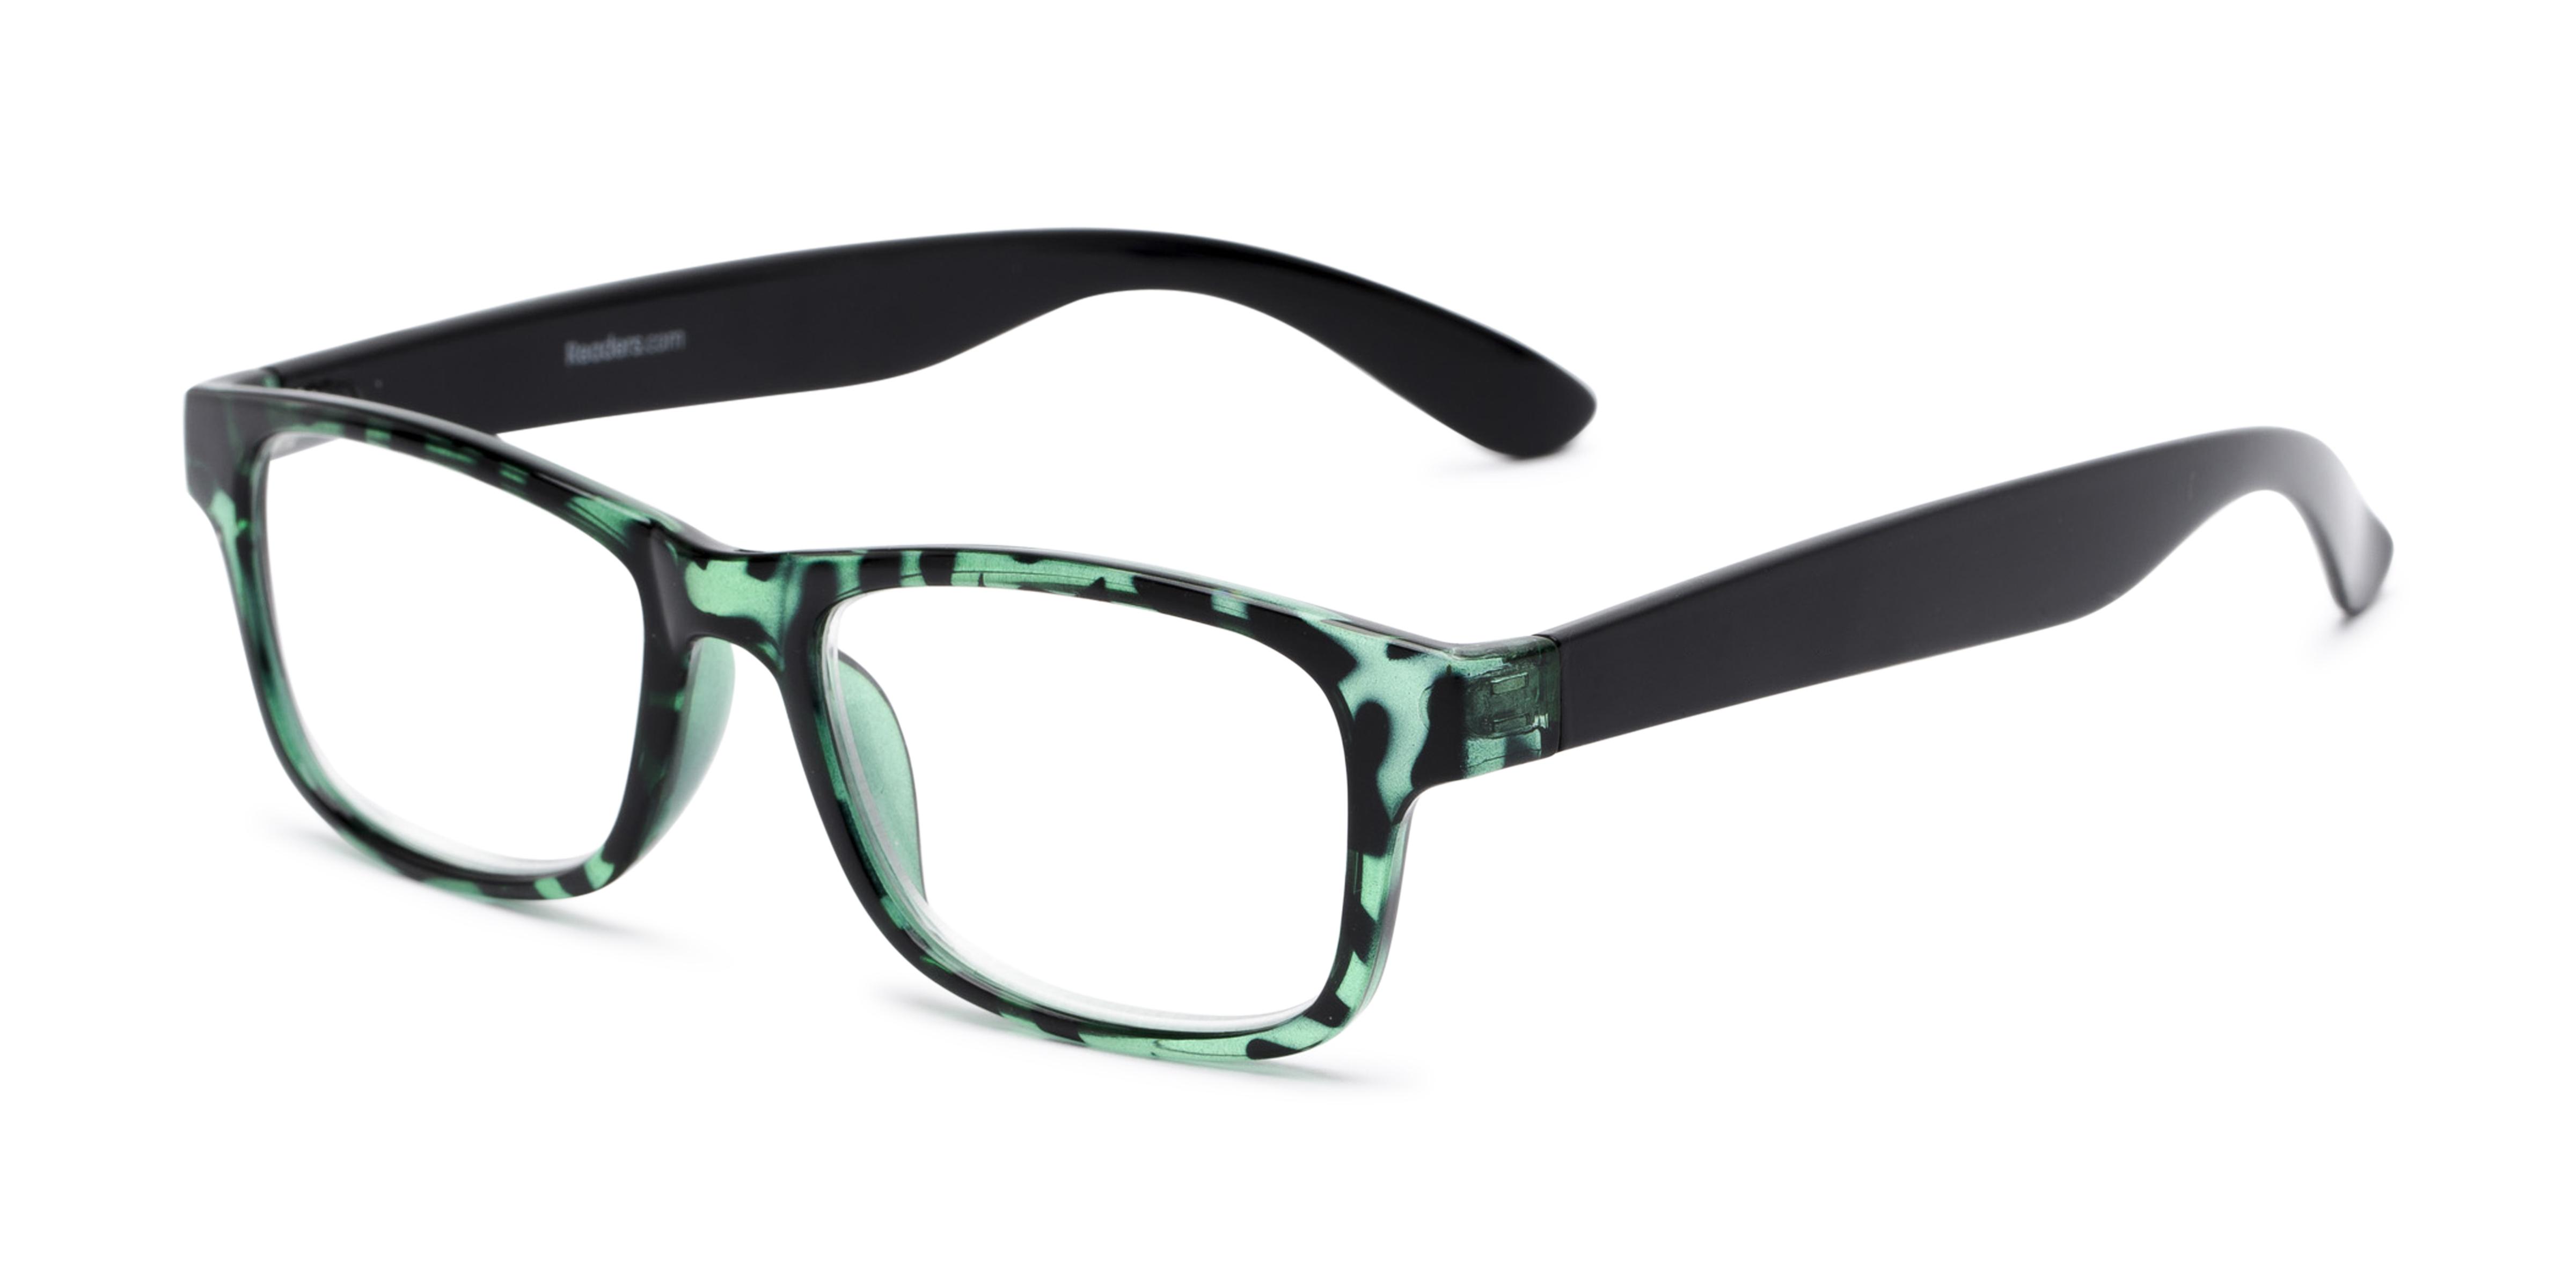 The Buchanon +1.50 Green Tortoise